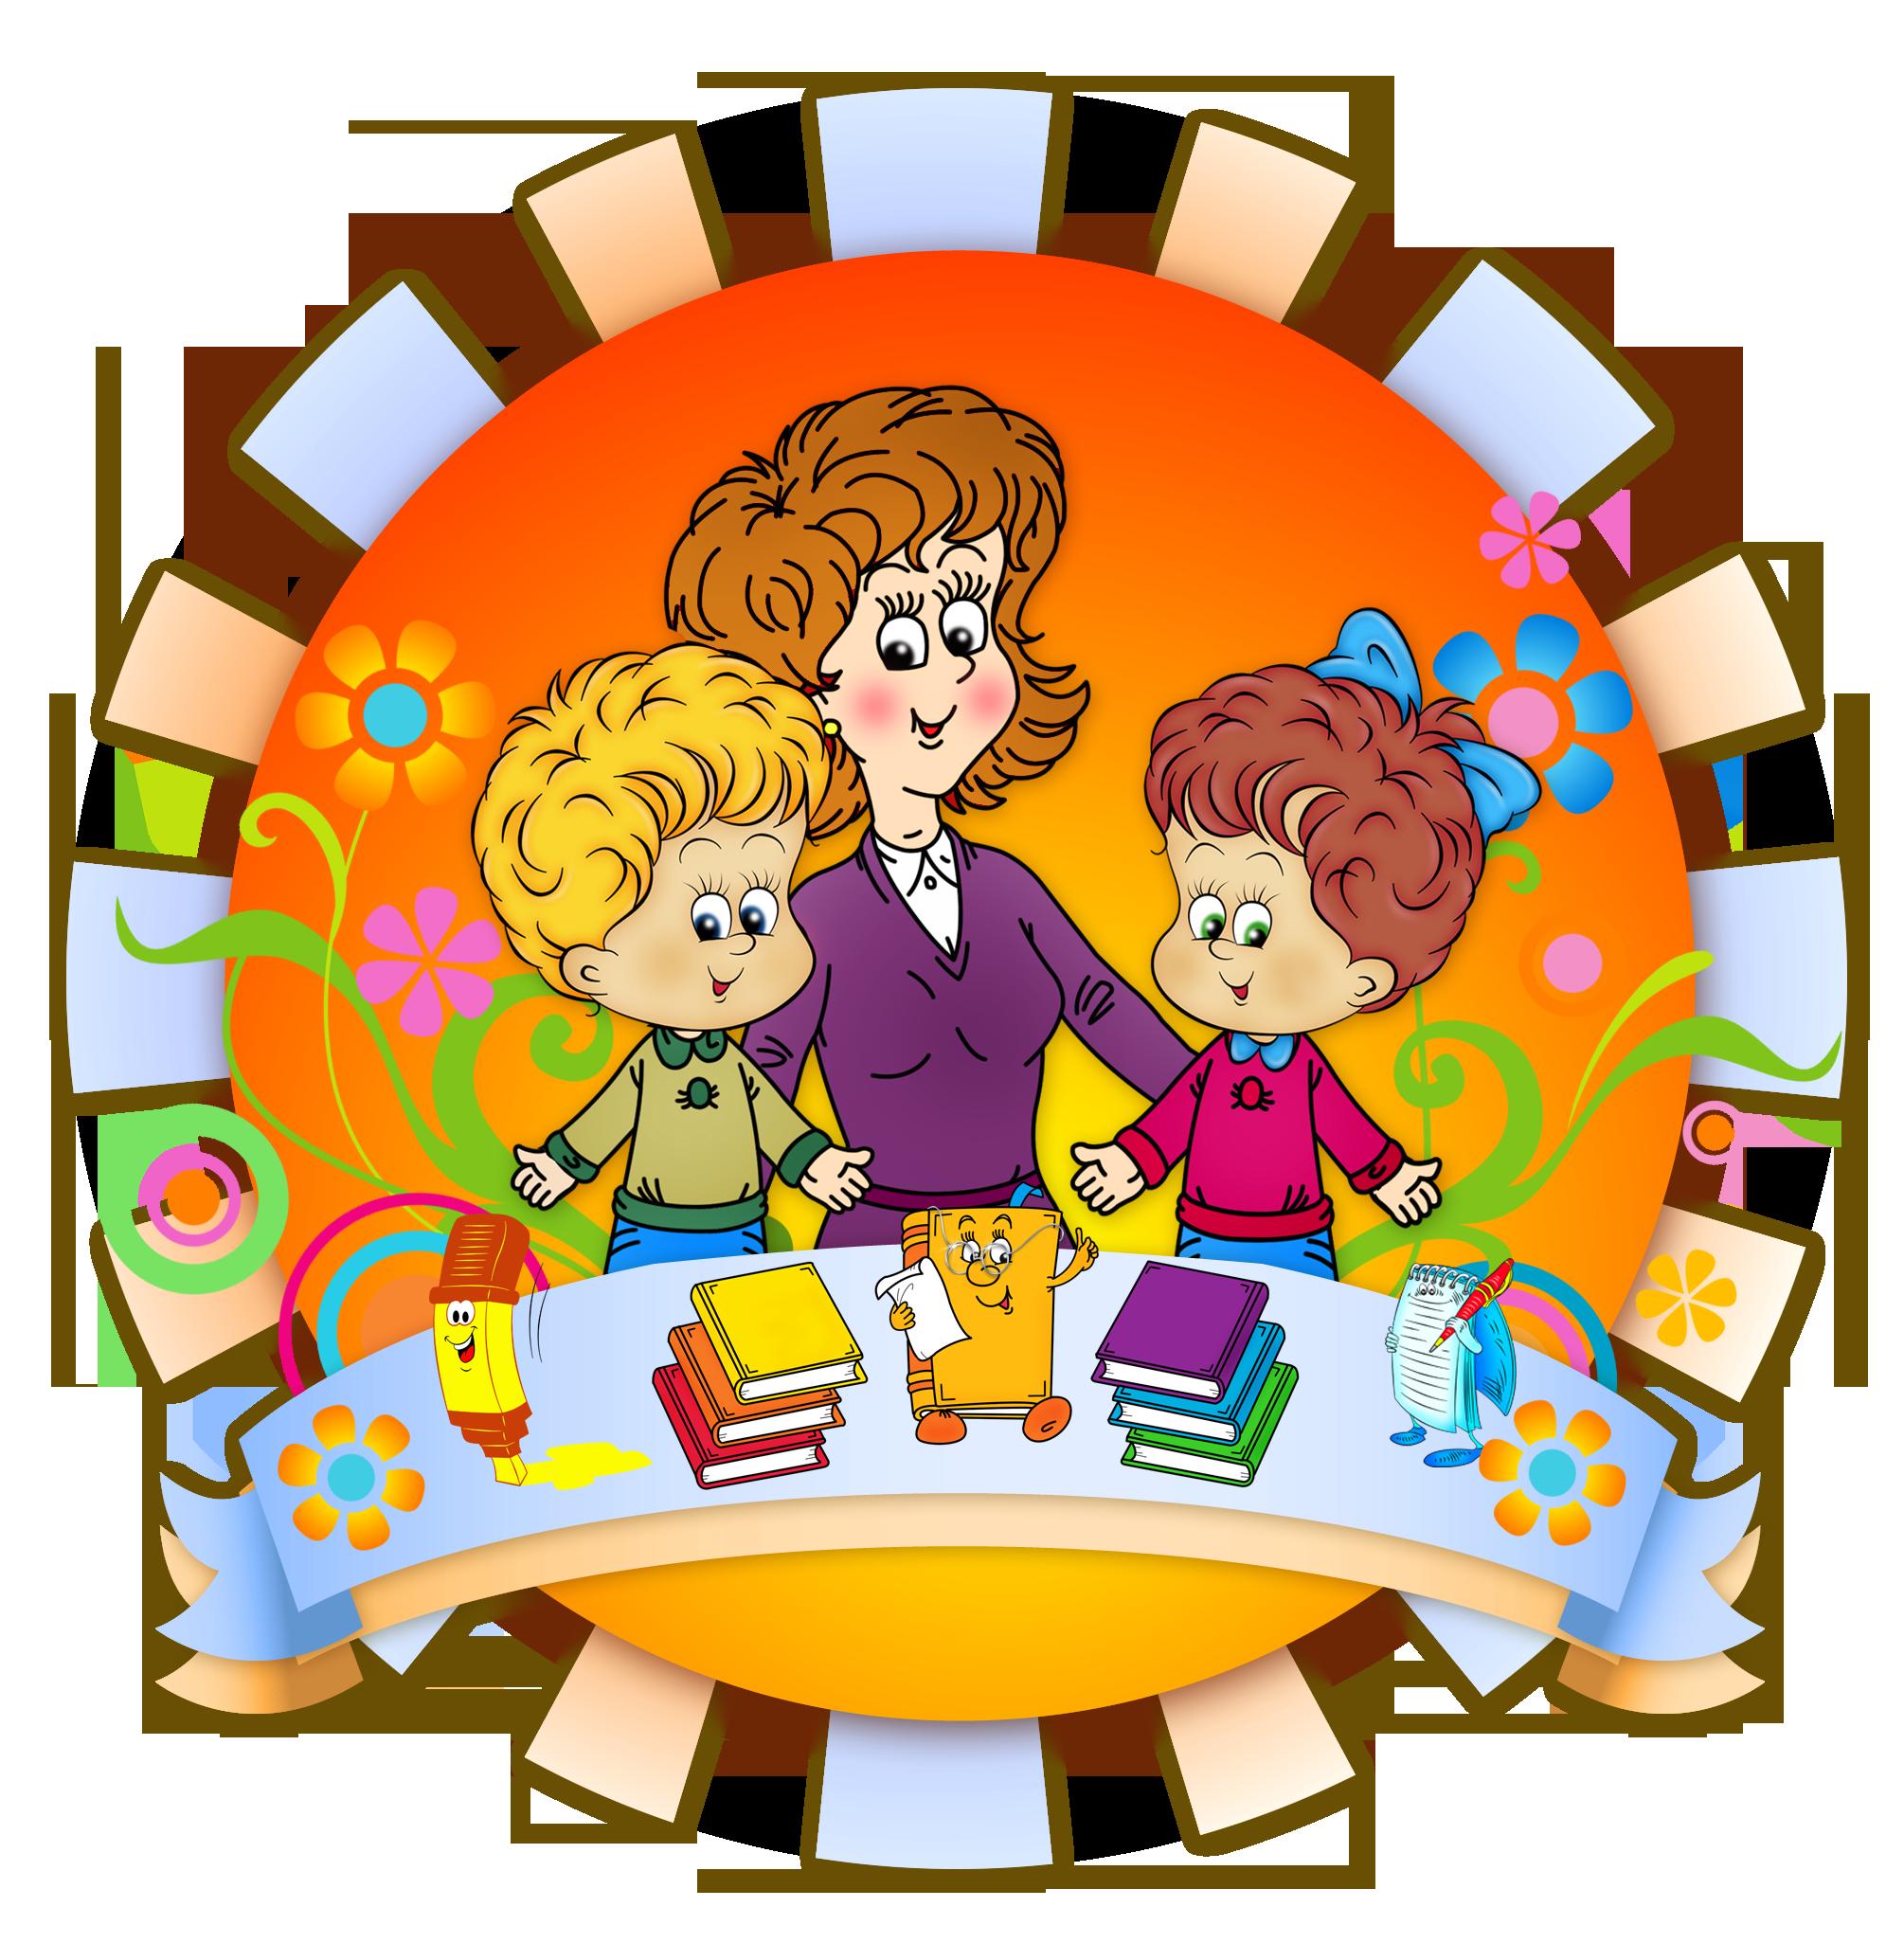 Улыбка, для детского сада картинки